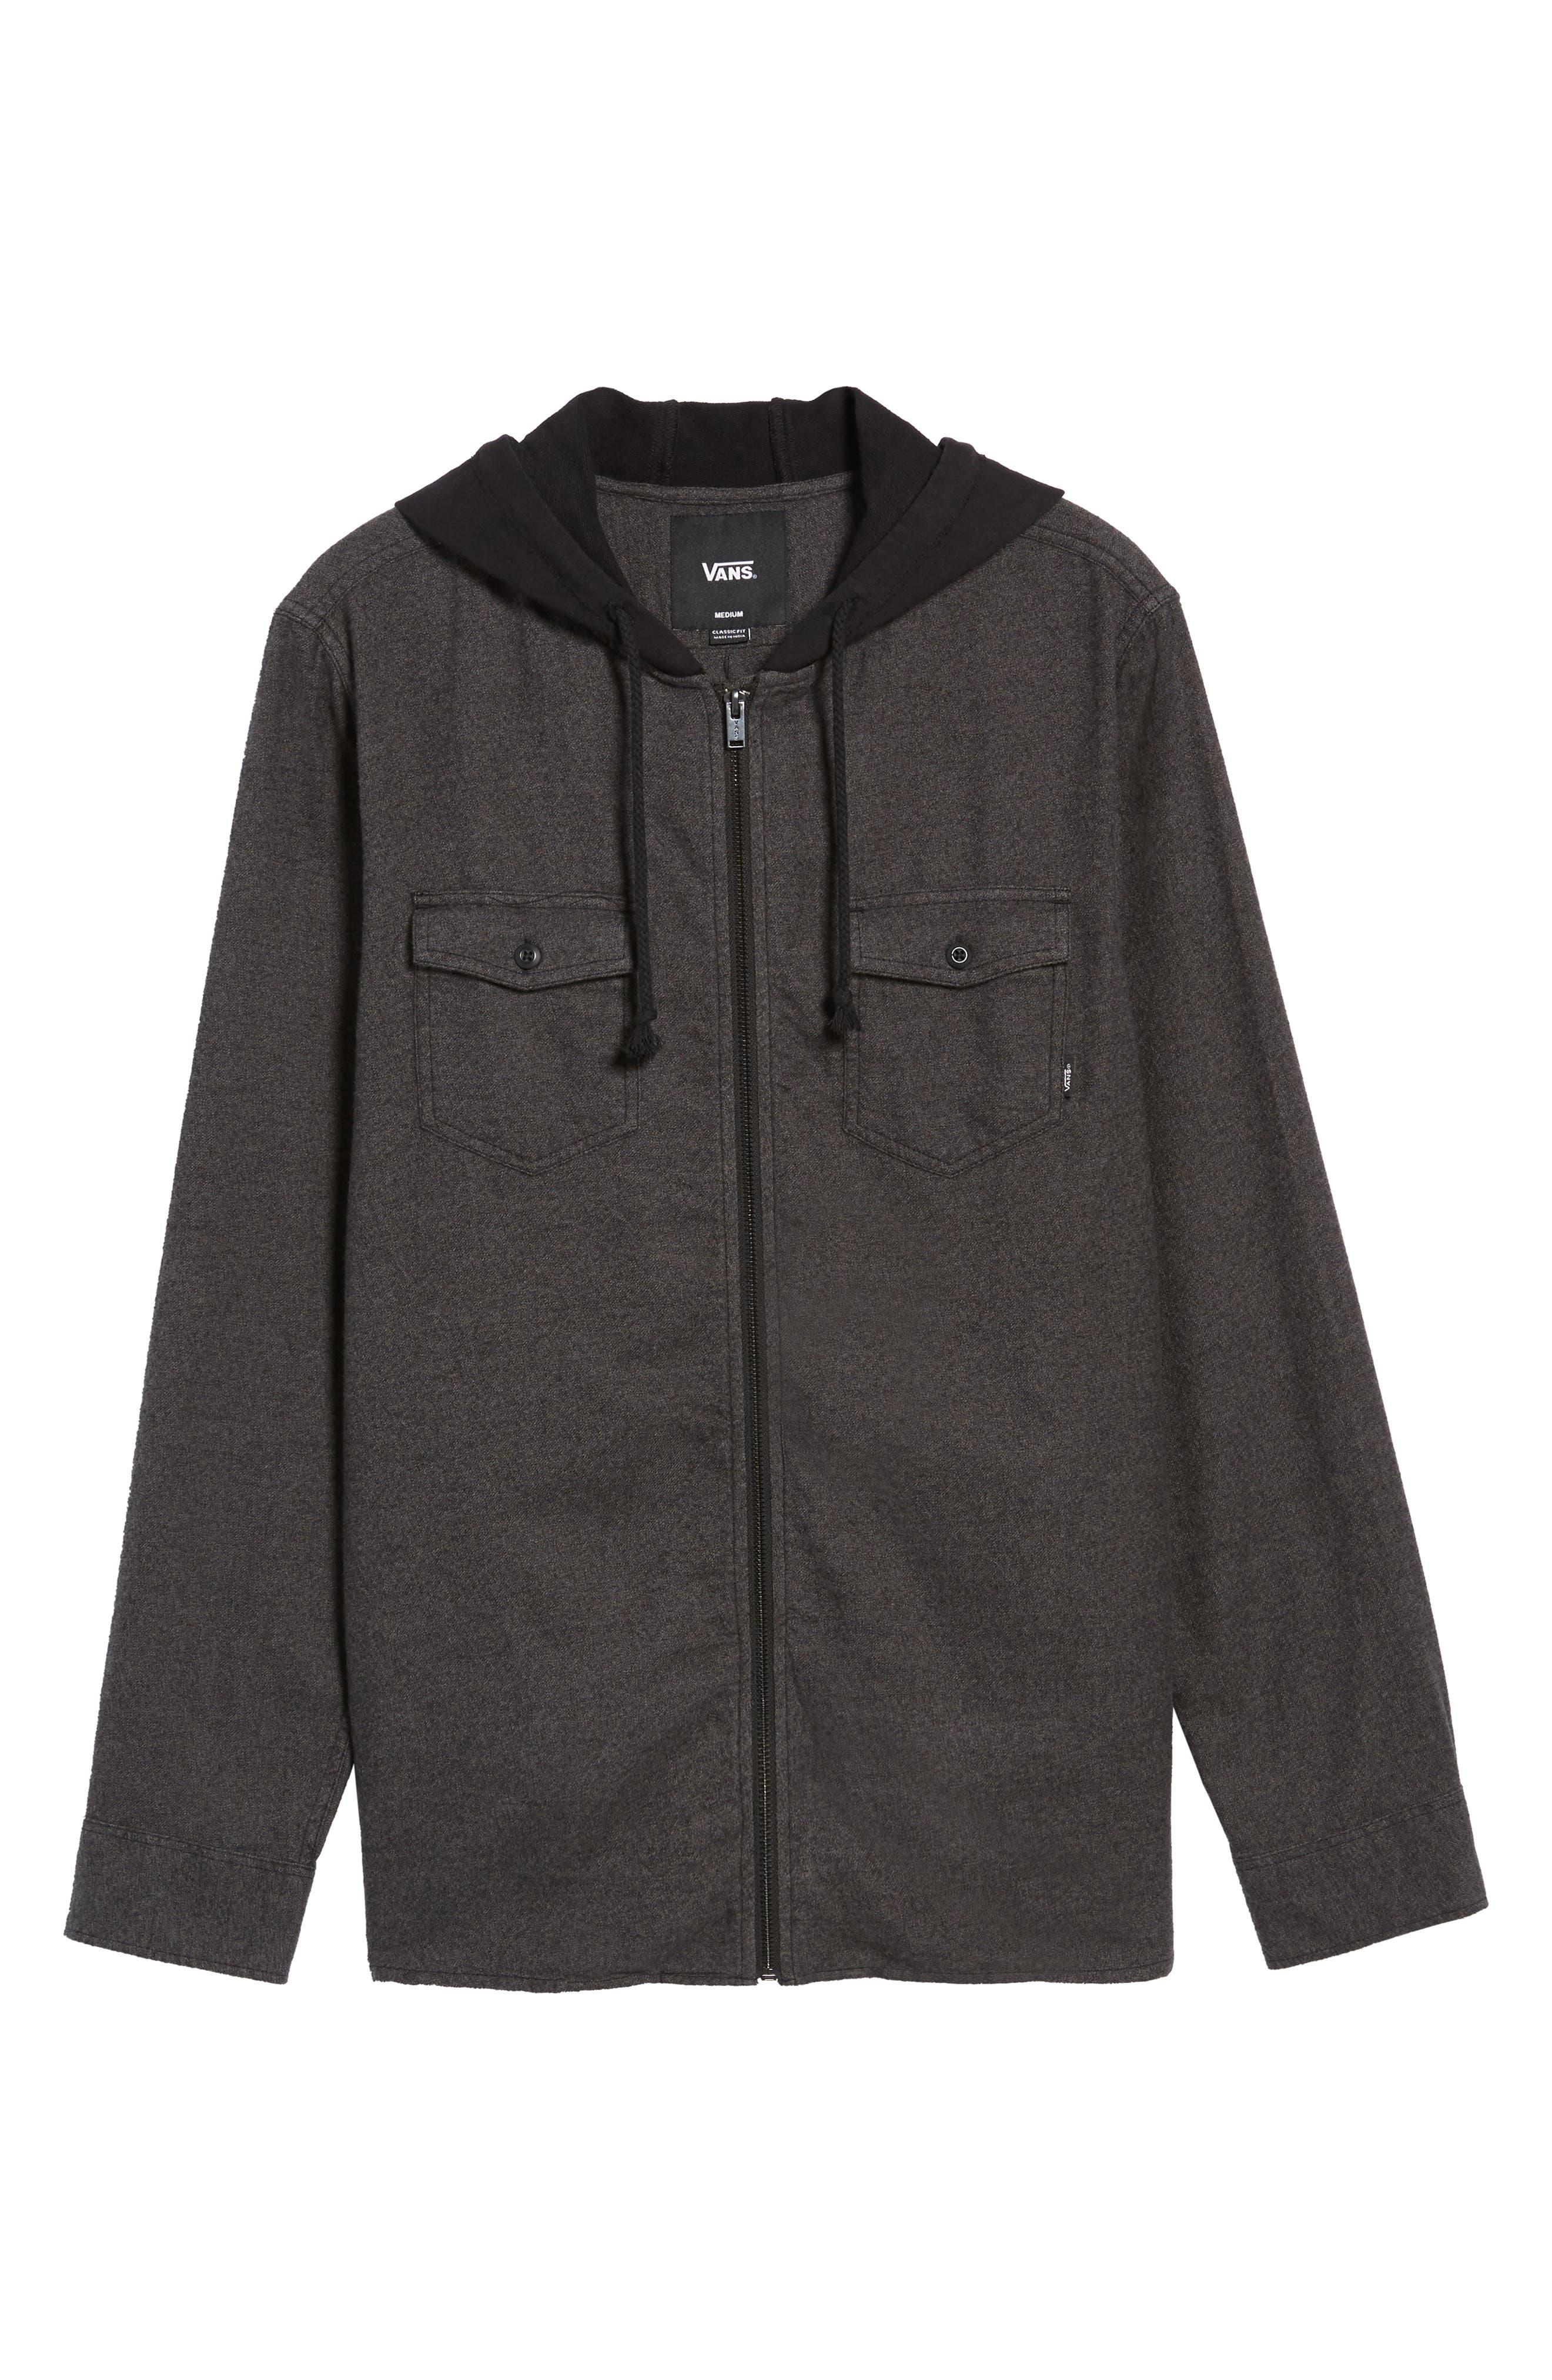 Never Mind Hooded Zip Shirt Jacket,                             Alternate thumbnail 6, color,                             001